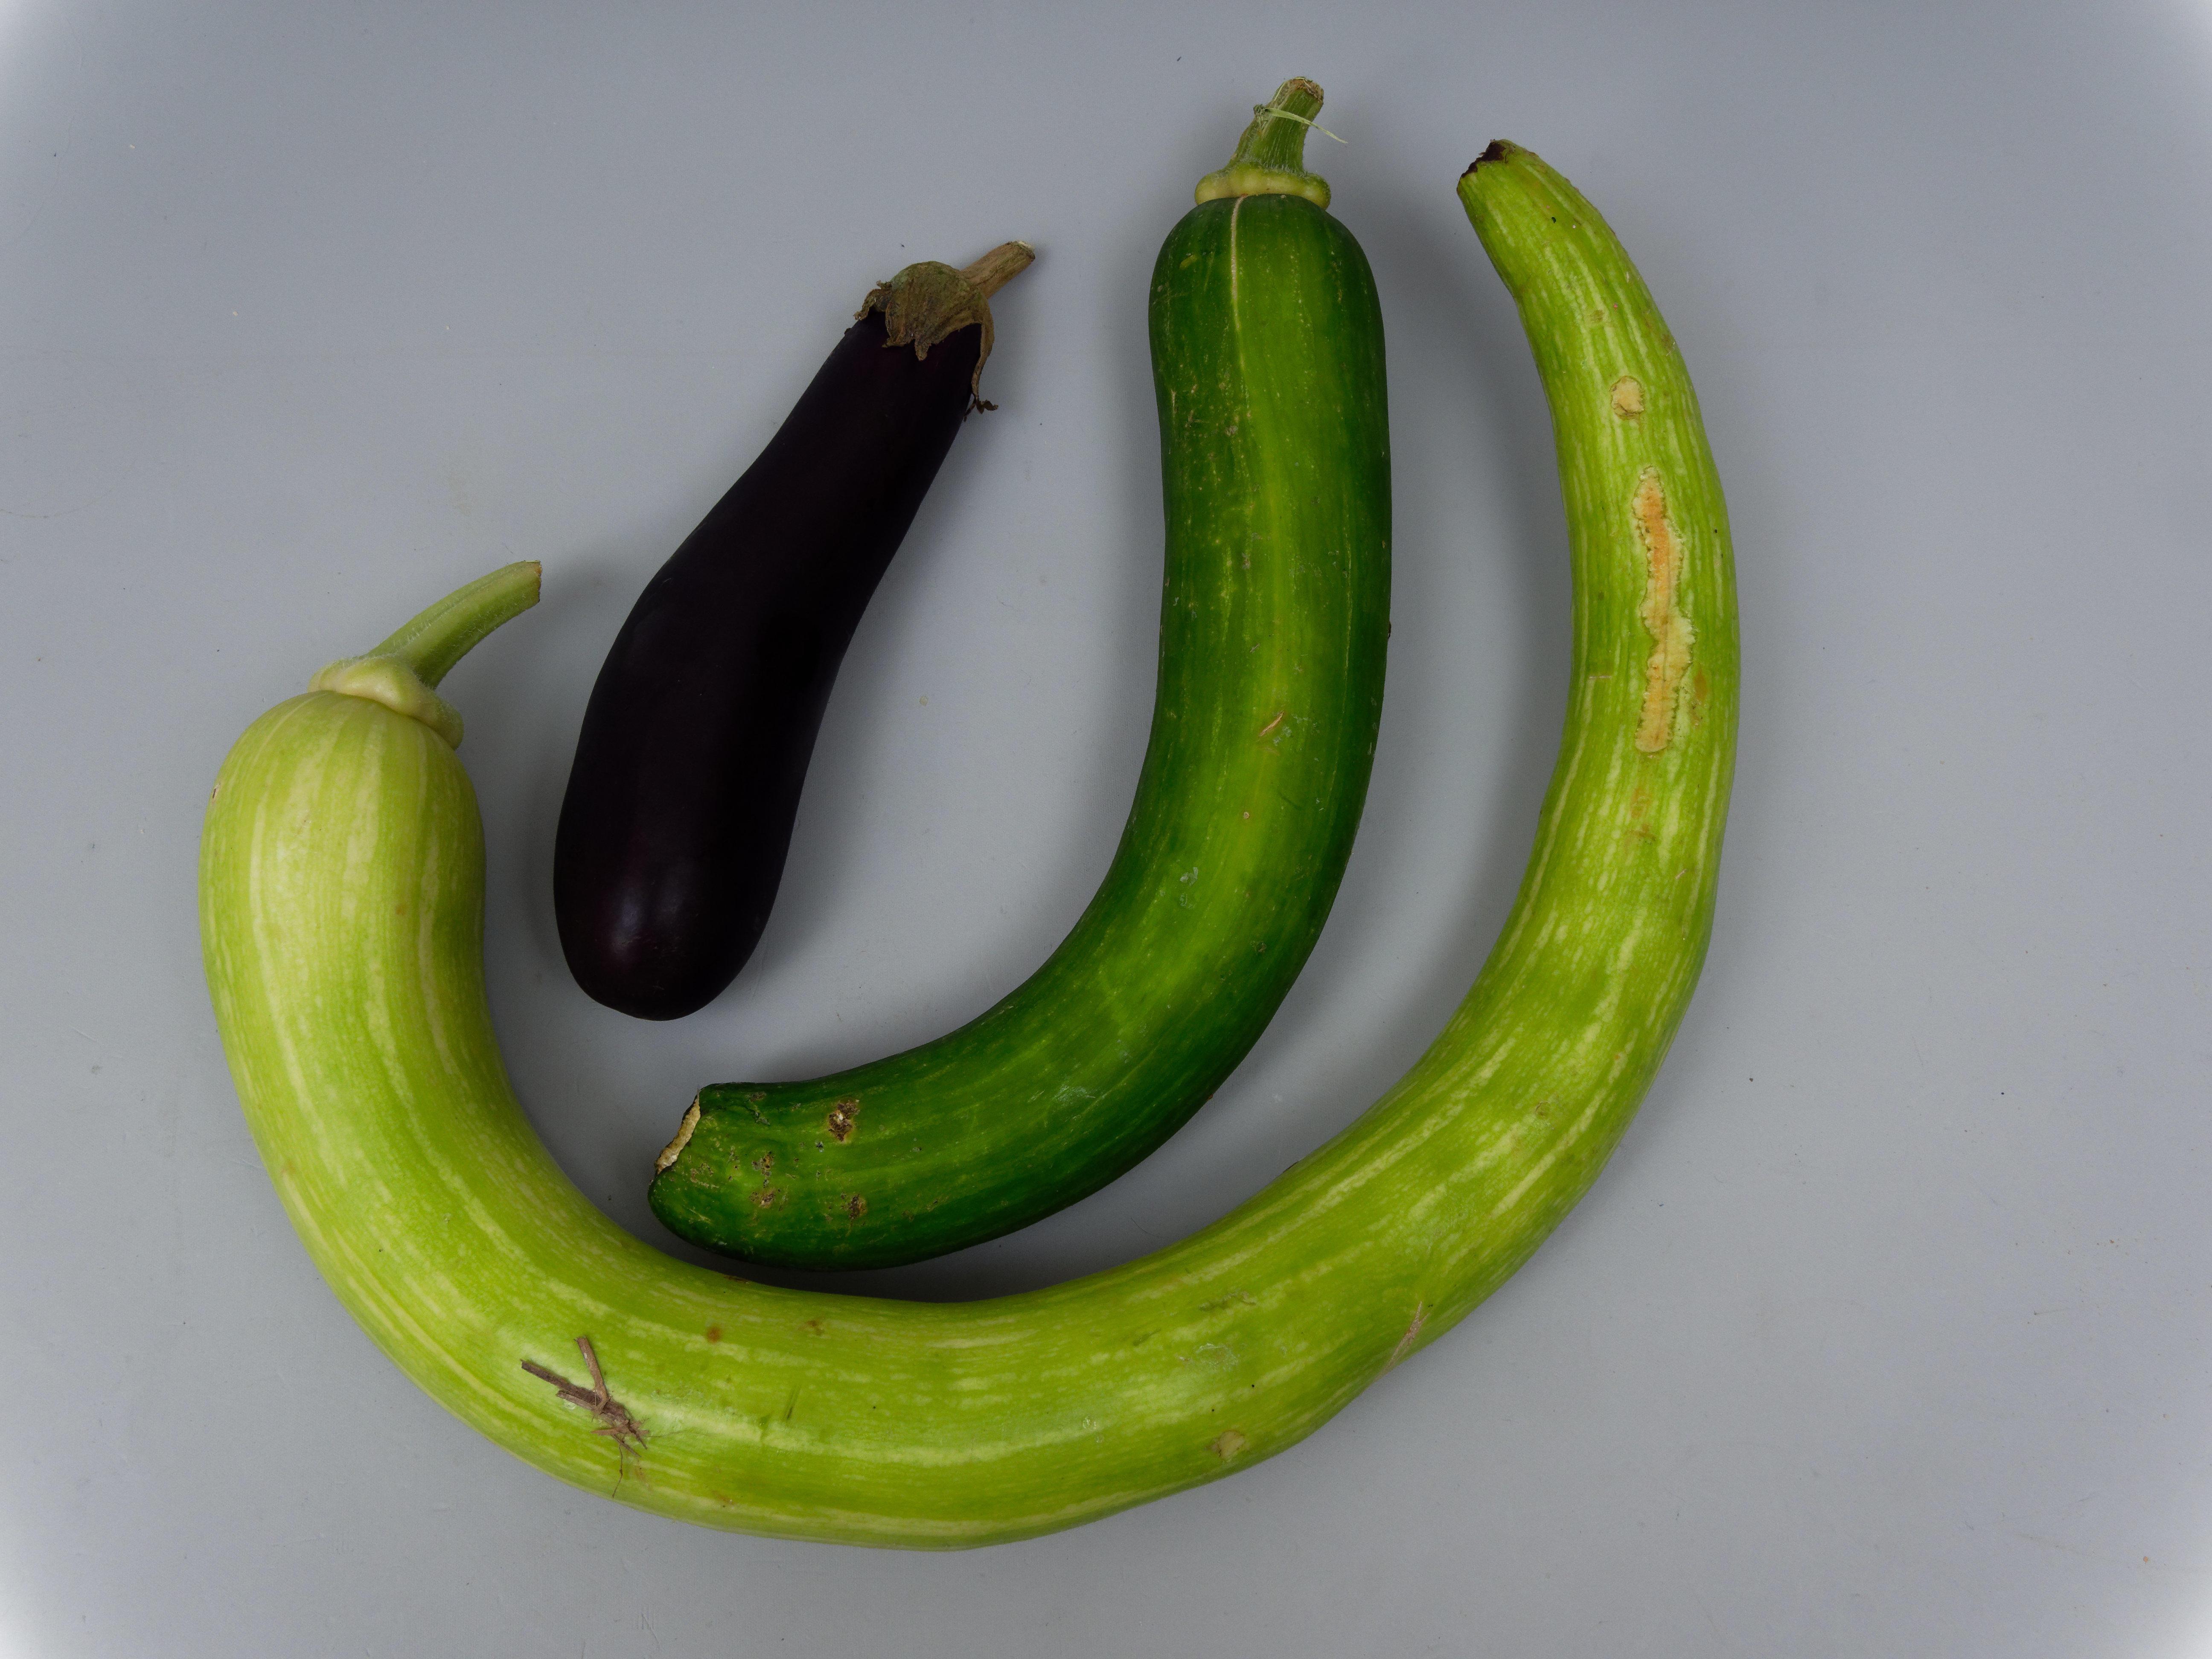 Aubergine-courgettes-1.jpeg